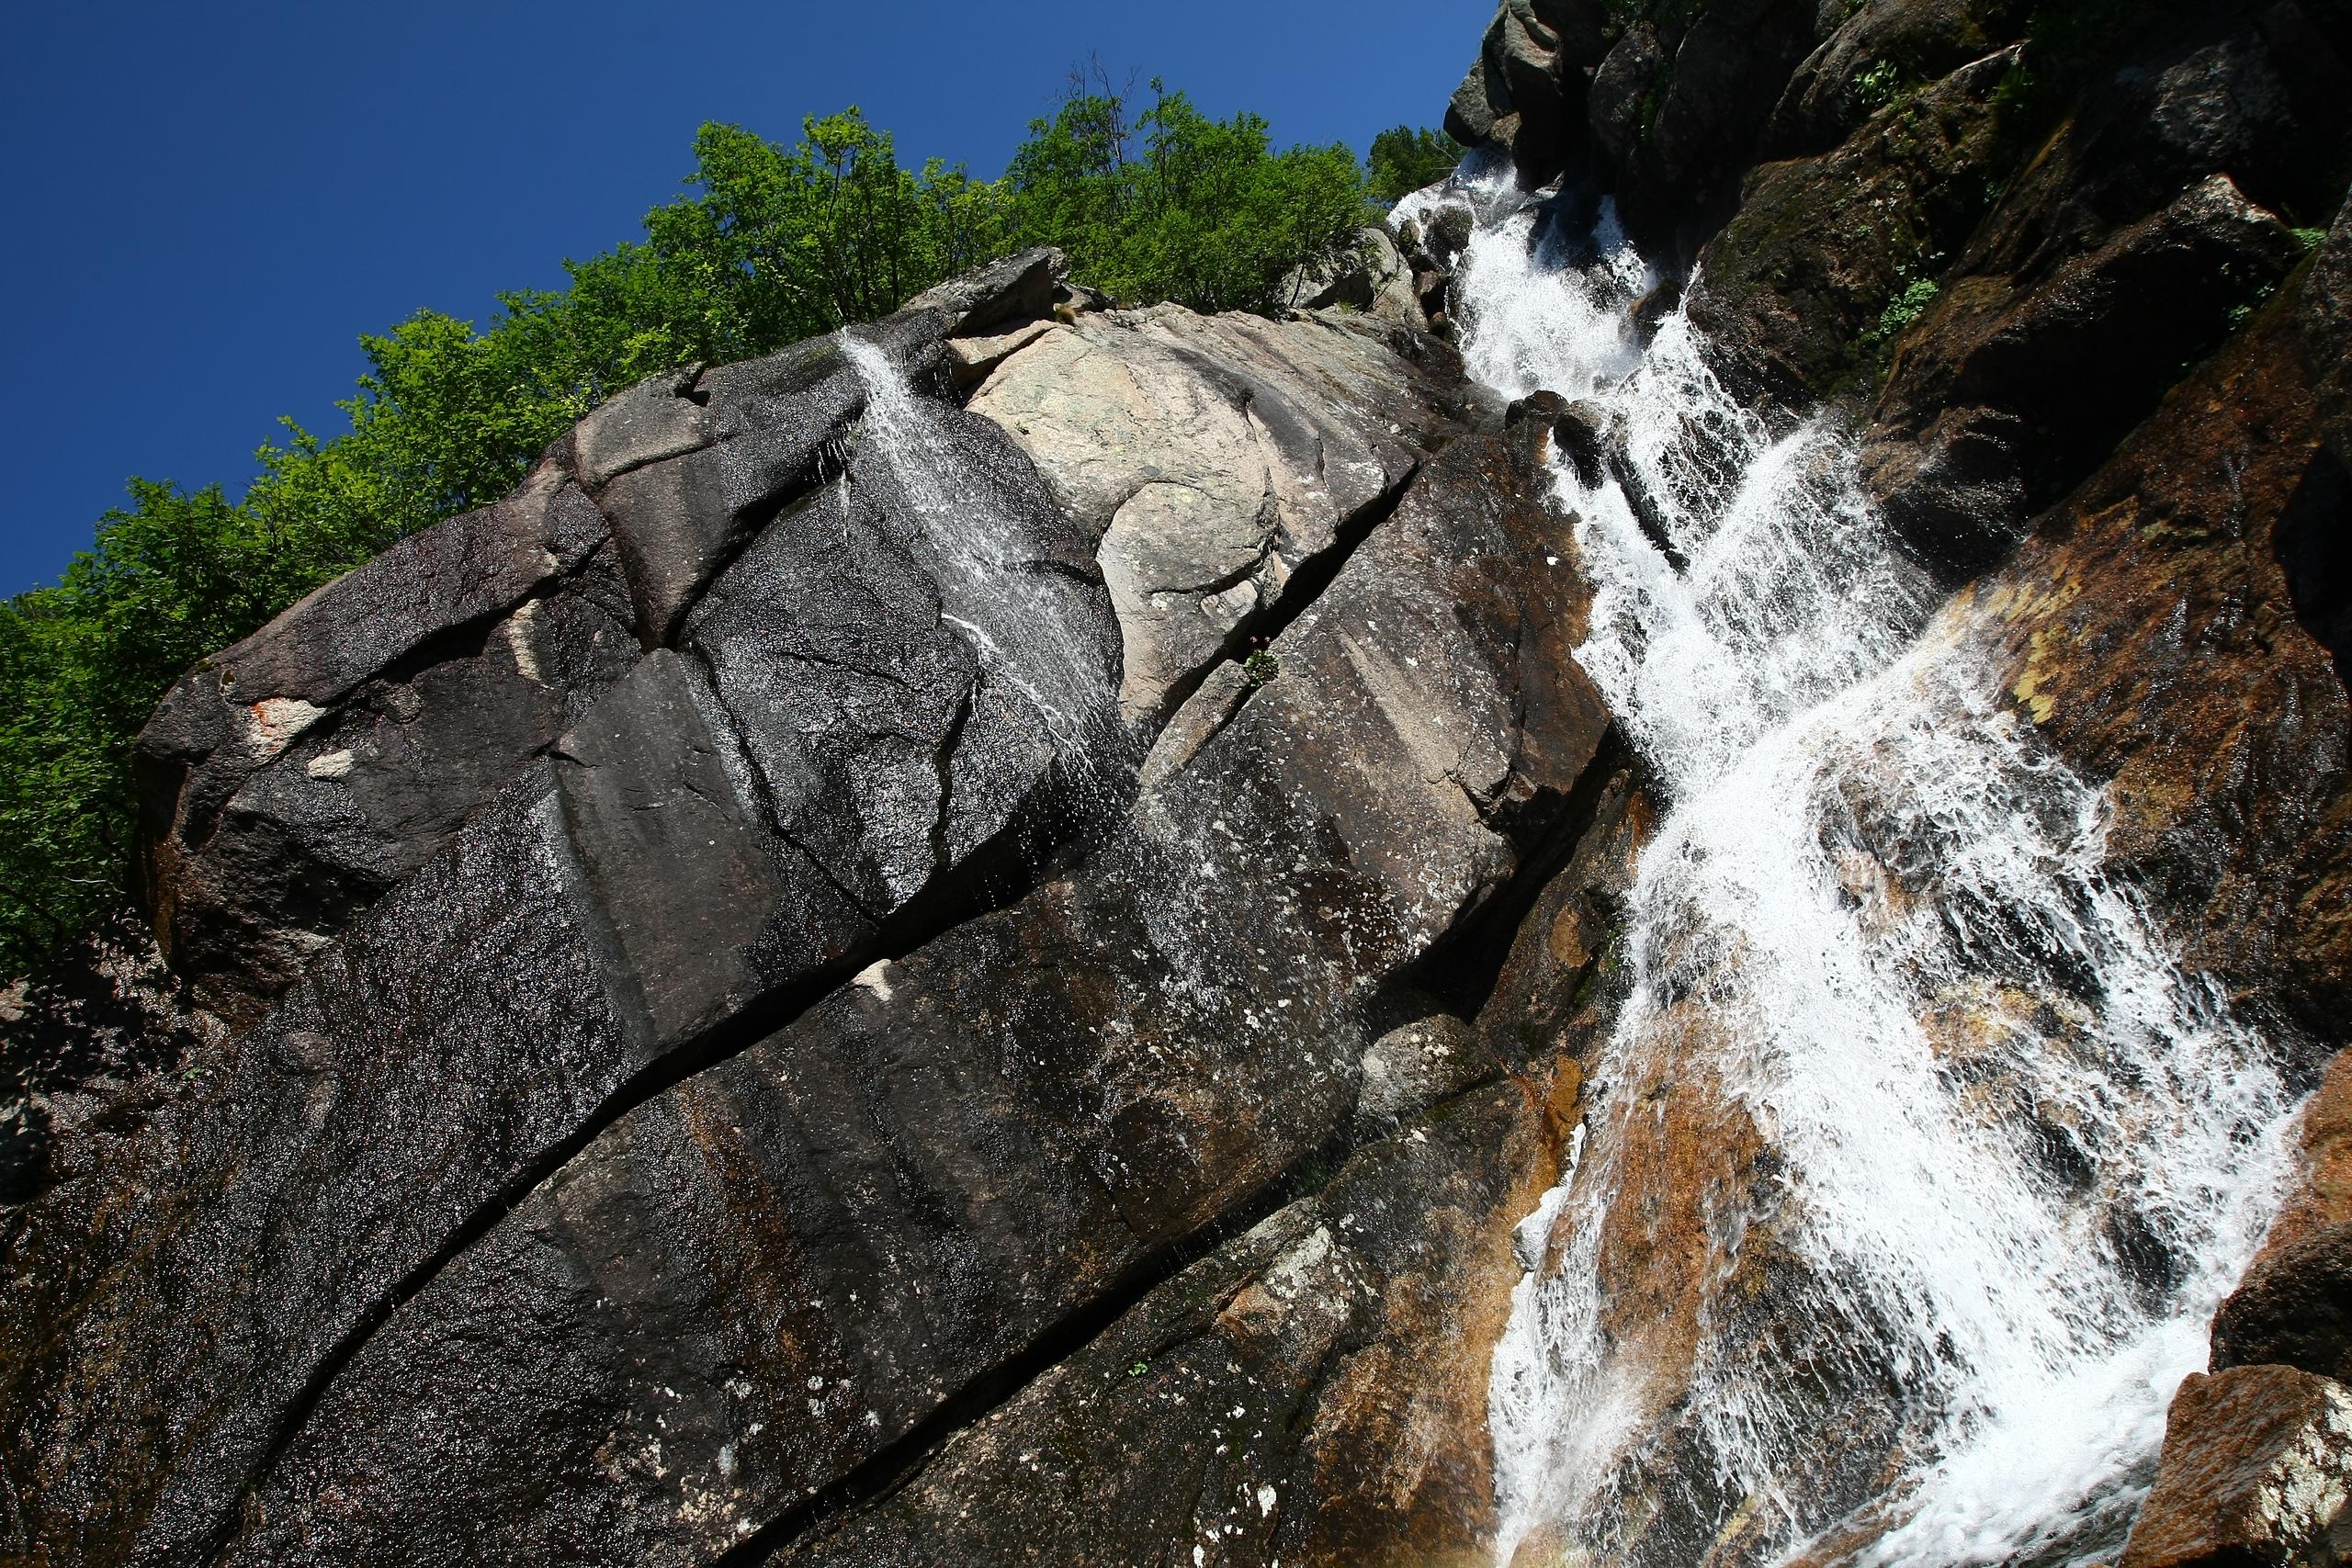 Водопад Горных духов. Фото: Константин Бураков